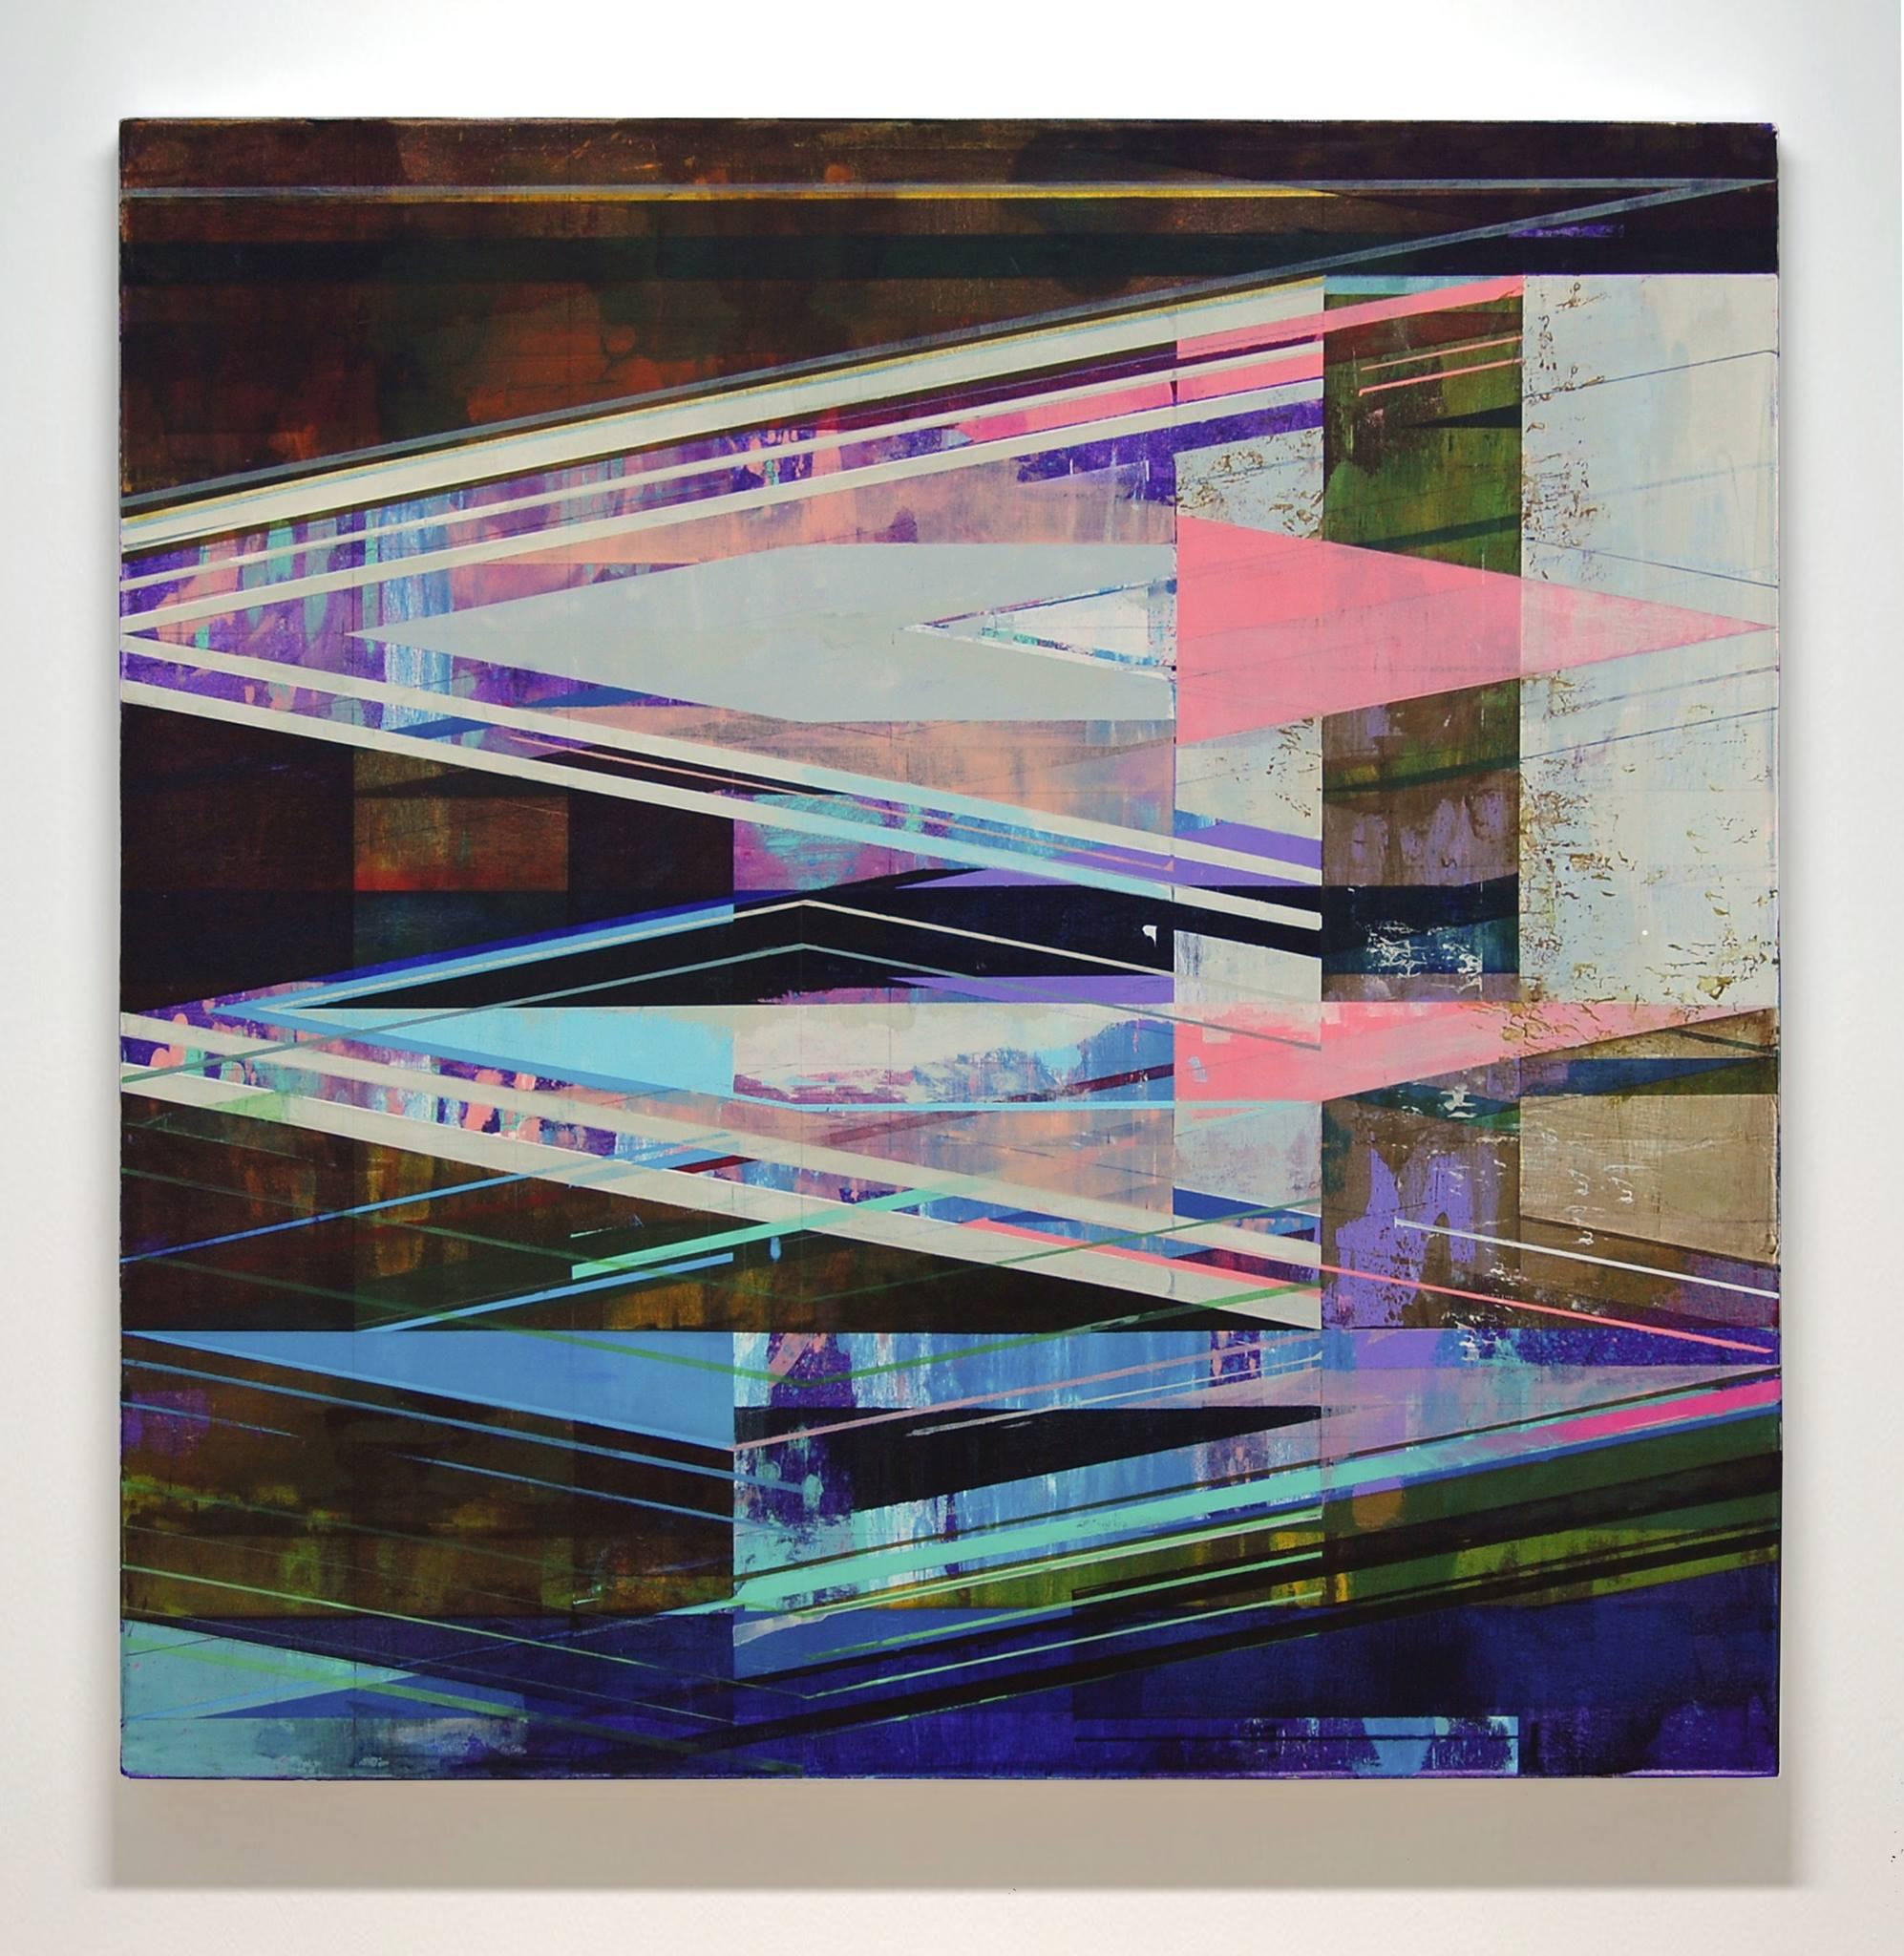 JOE LLOYD, Bevel, 2015, acrylic on canvas, 42 x 42 inches